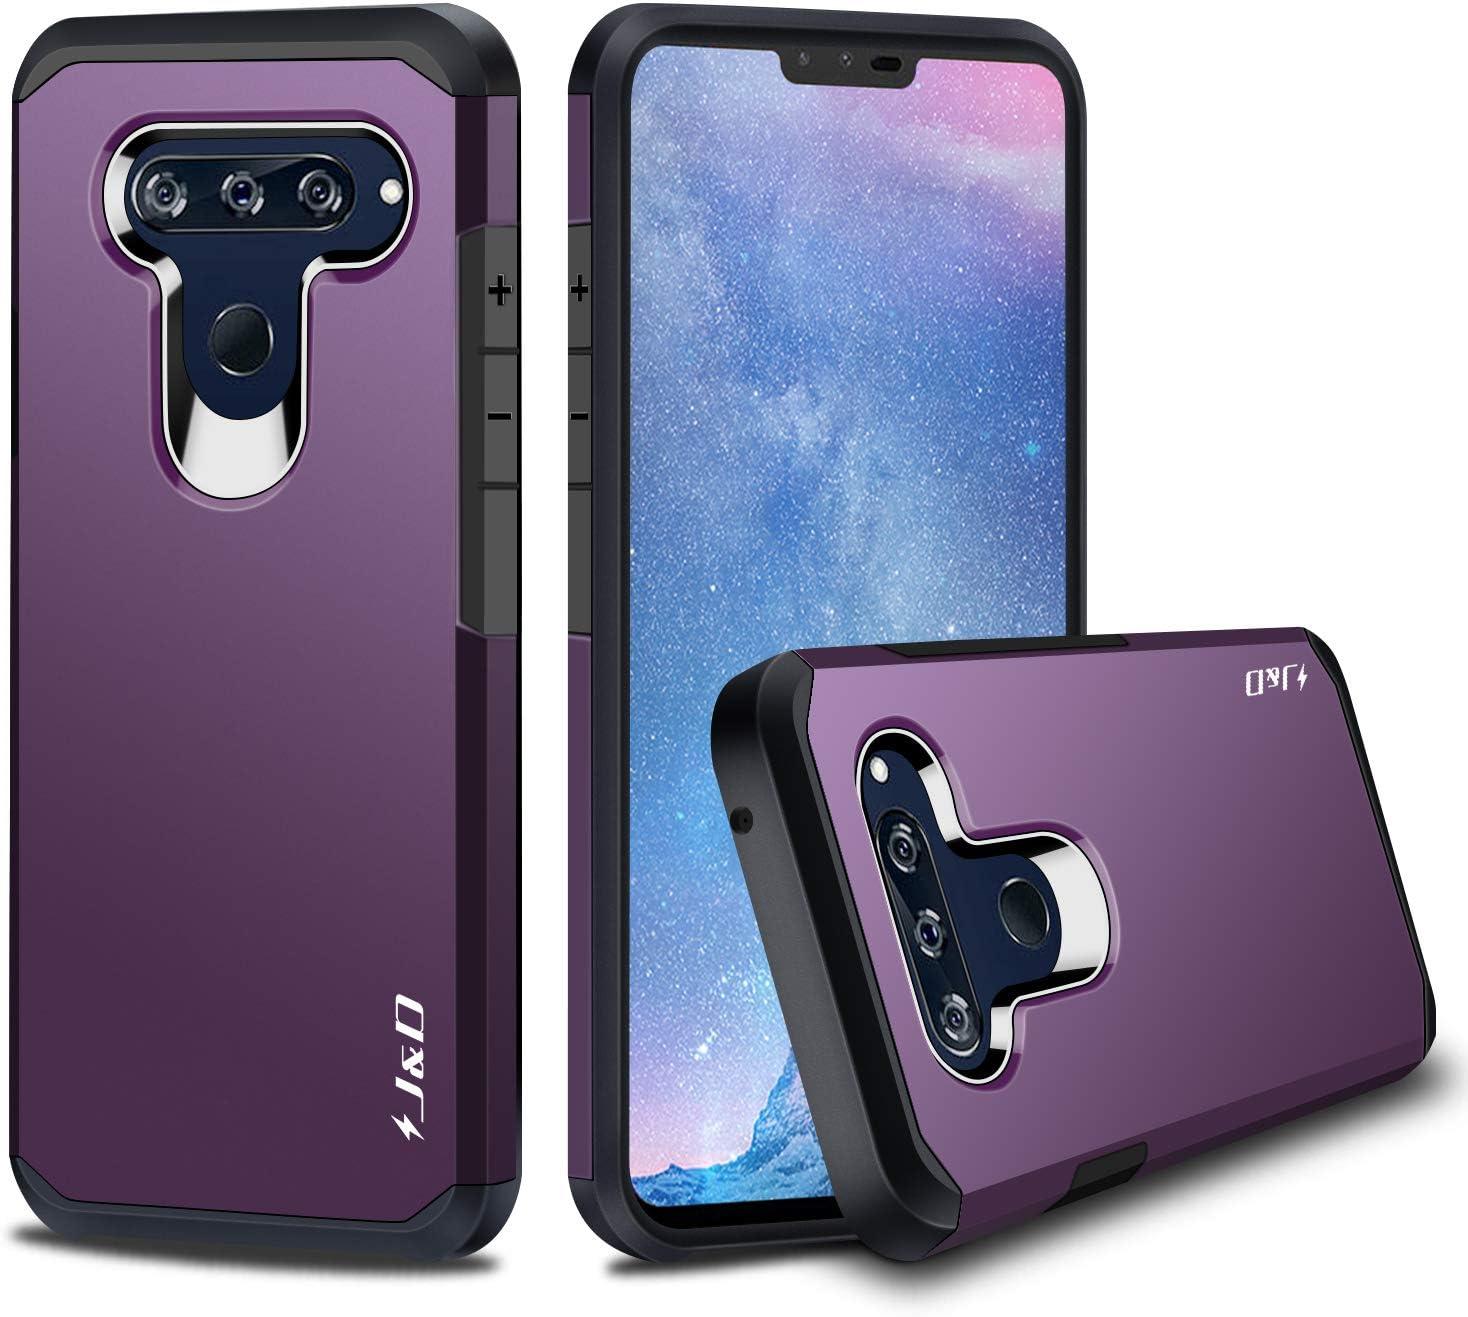 J&D Case Compatible for LG V40 ThinQ Case/LG V40 Case, Heavy Duty [Dual Layer] Hybrid Shock Proof Protective Rugged Bumper Case for LG V40 ThinQ, LG V40 Case - Purple